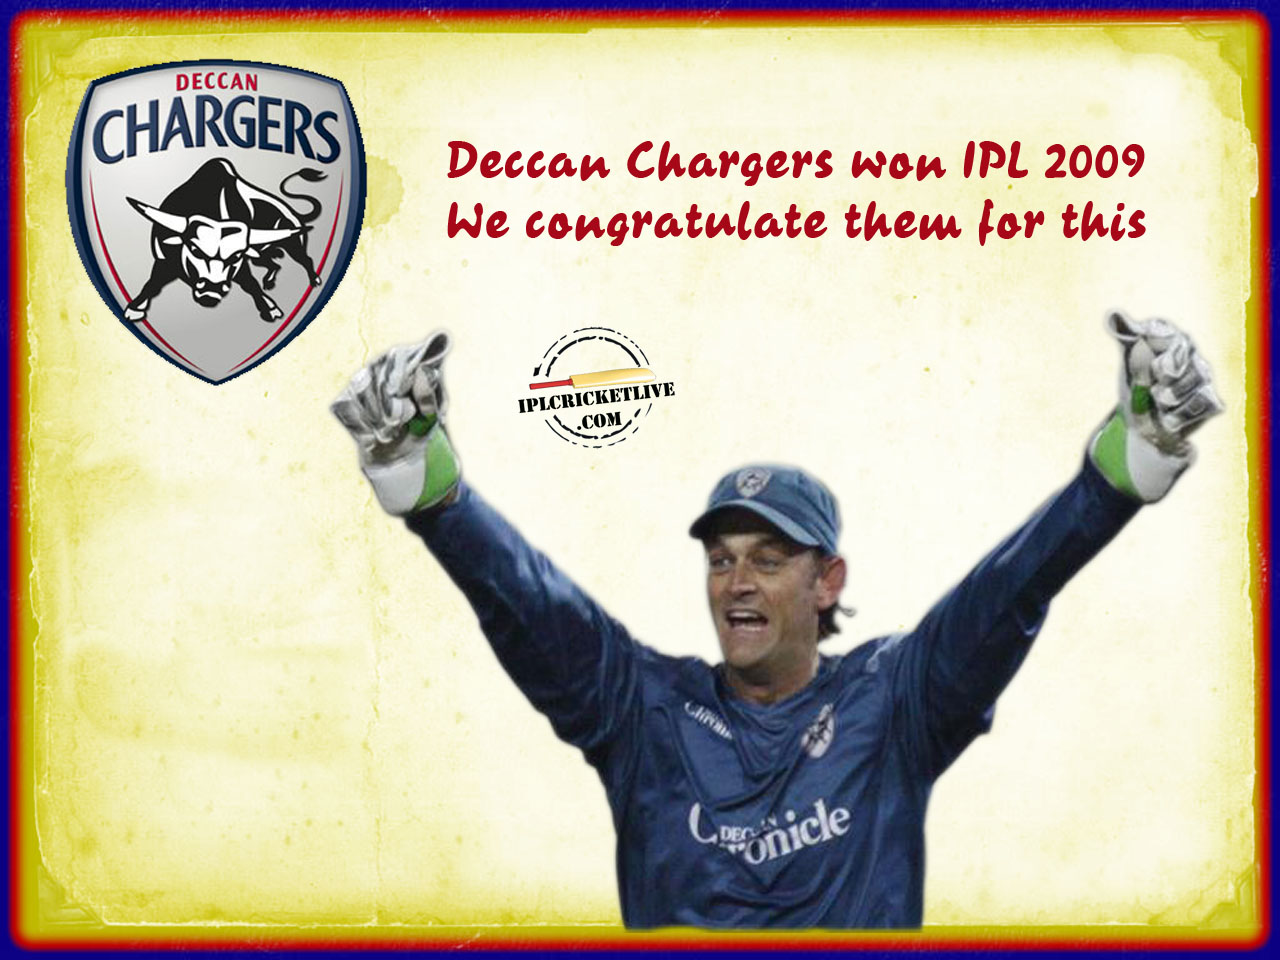 CRICKET: IPL 2009 IMAGES